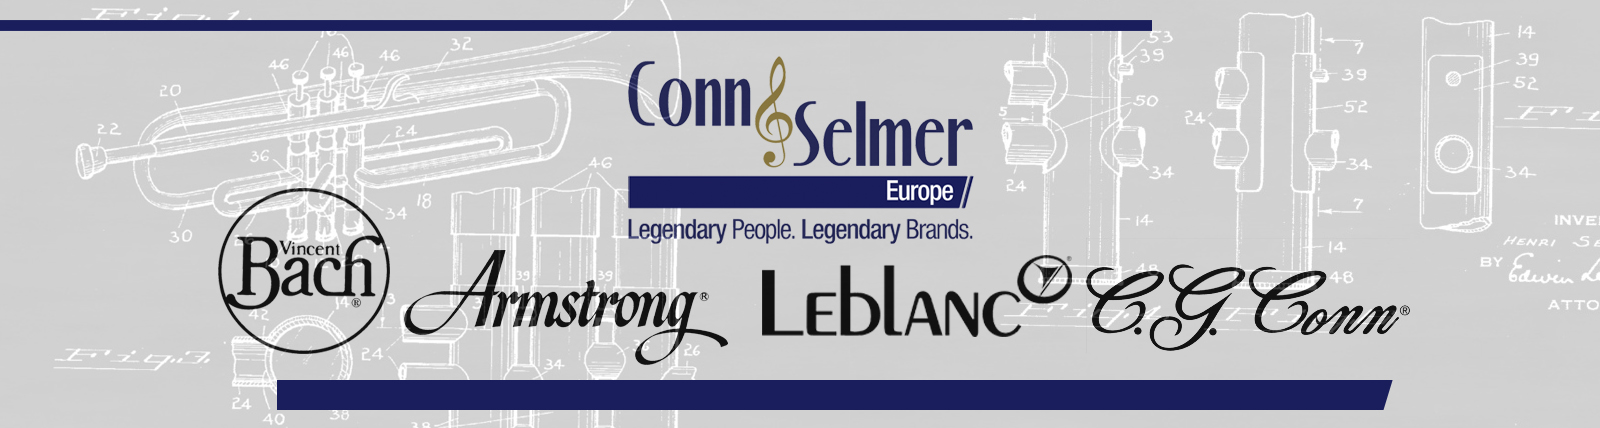 Banner Conn Selmer